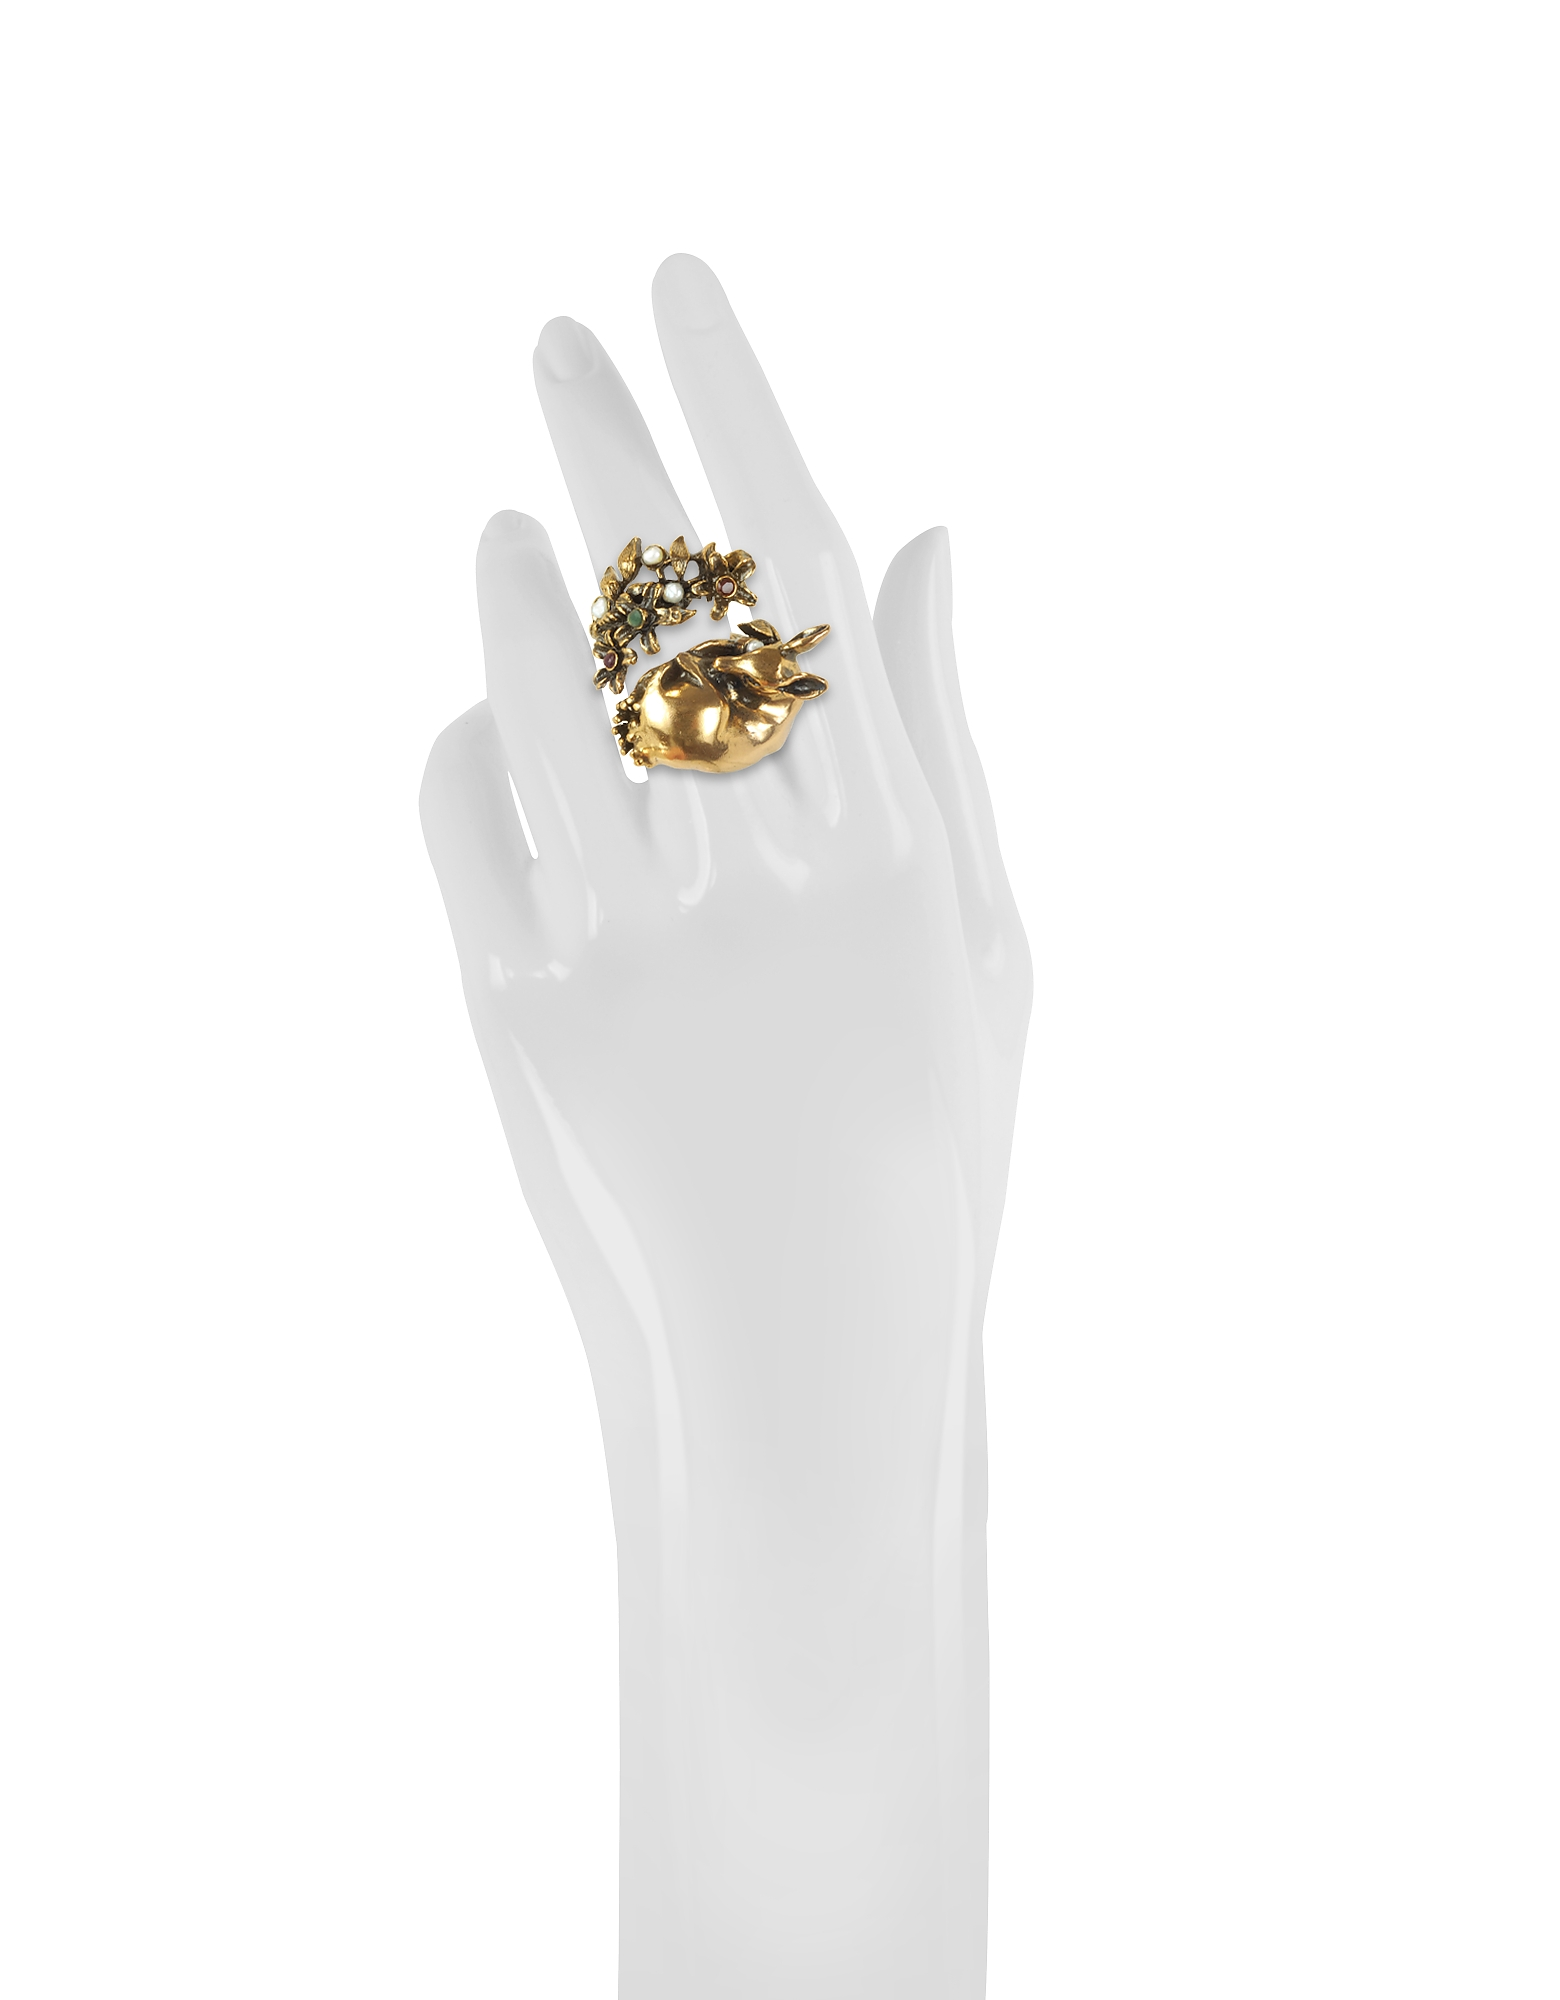 Fawn Goldtone Brass Ring w/Glass Pearl от Forzieri.com INT